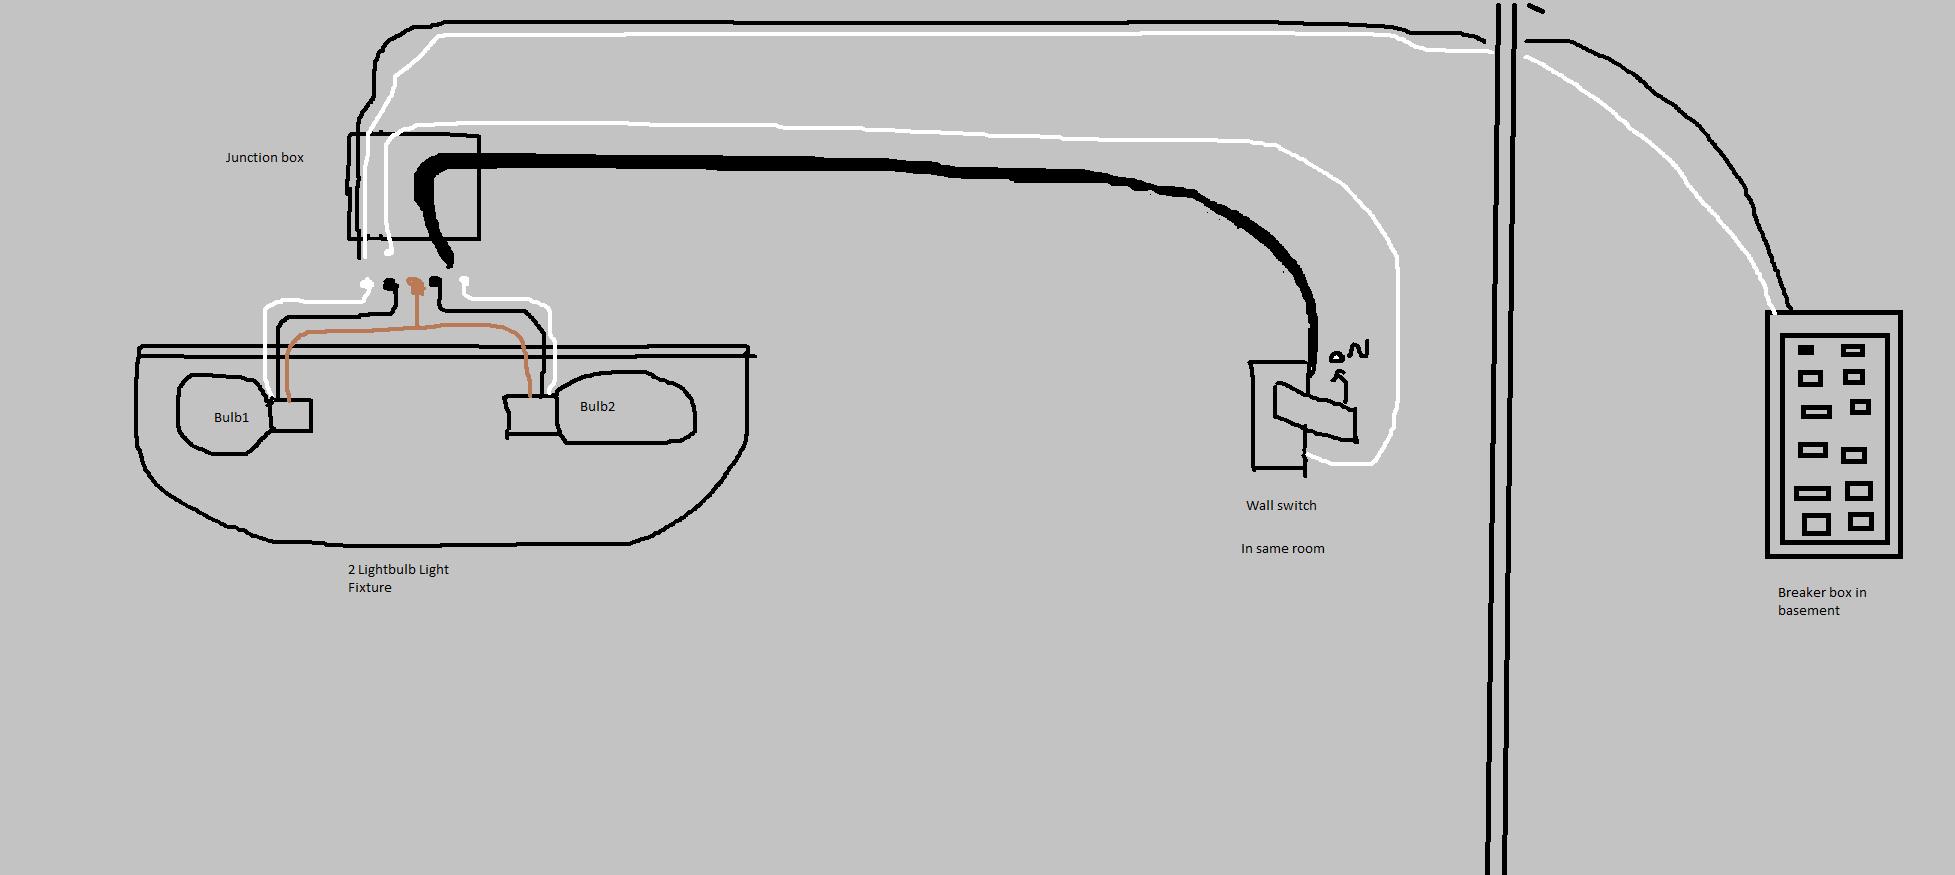 Ceiling Light Wiring Diagram